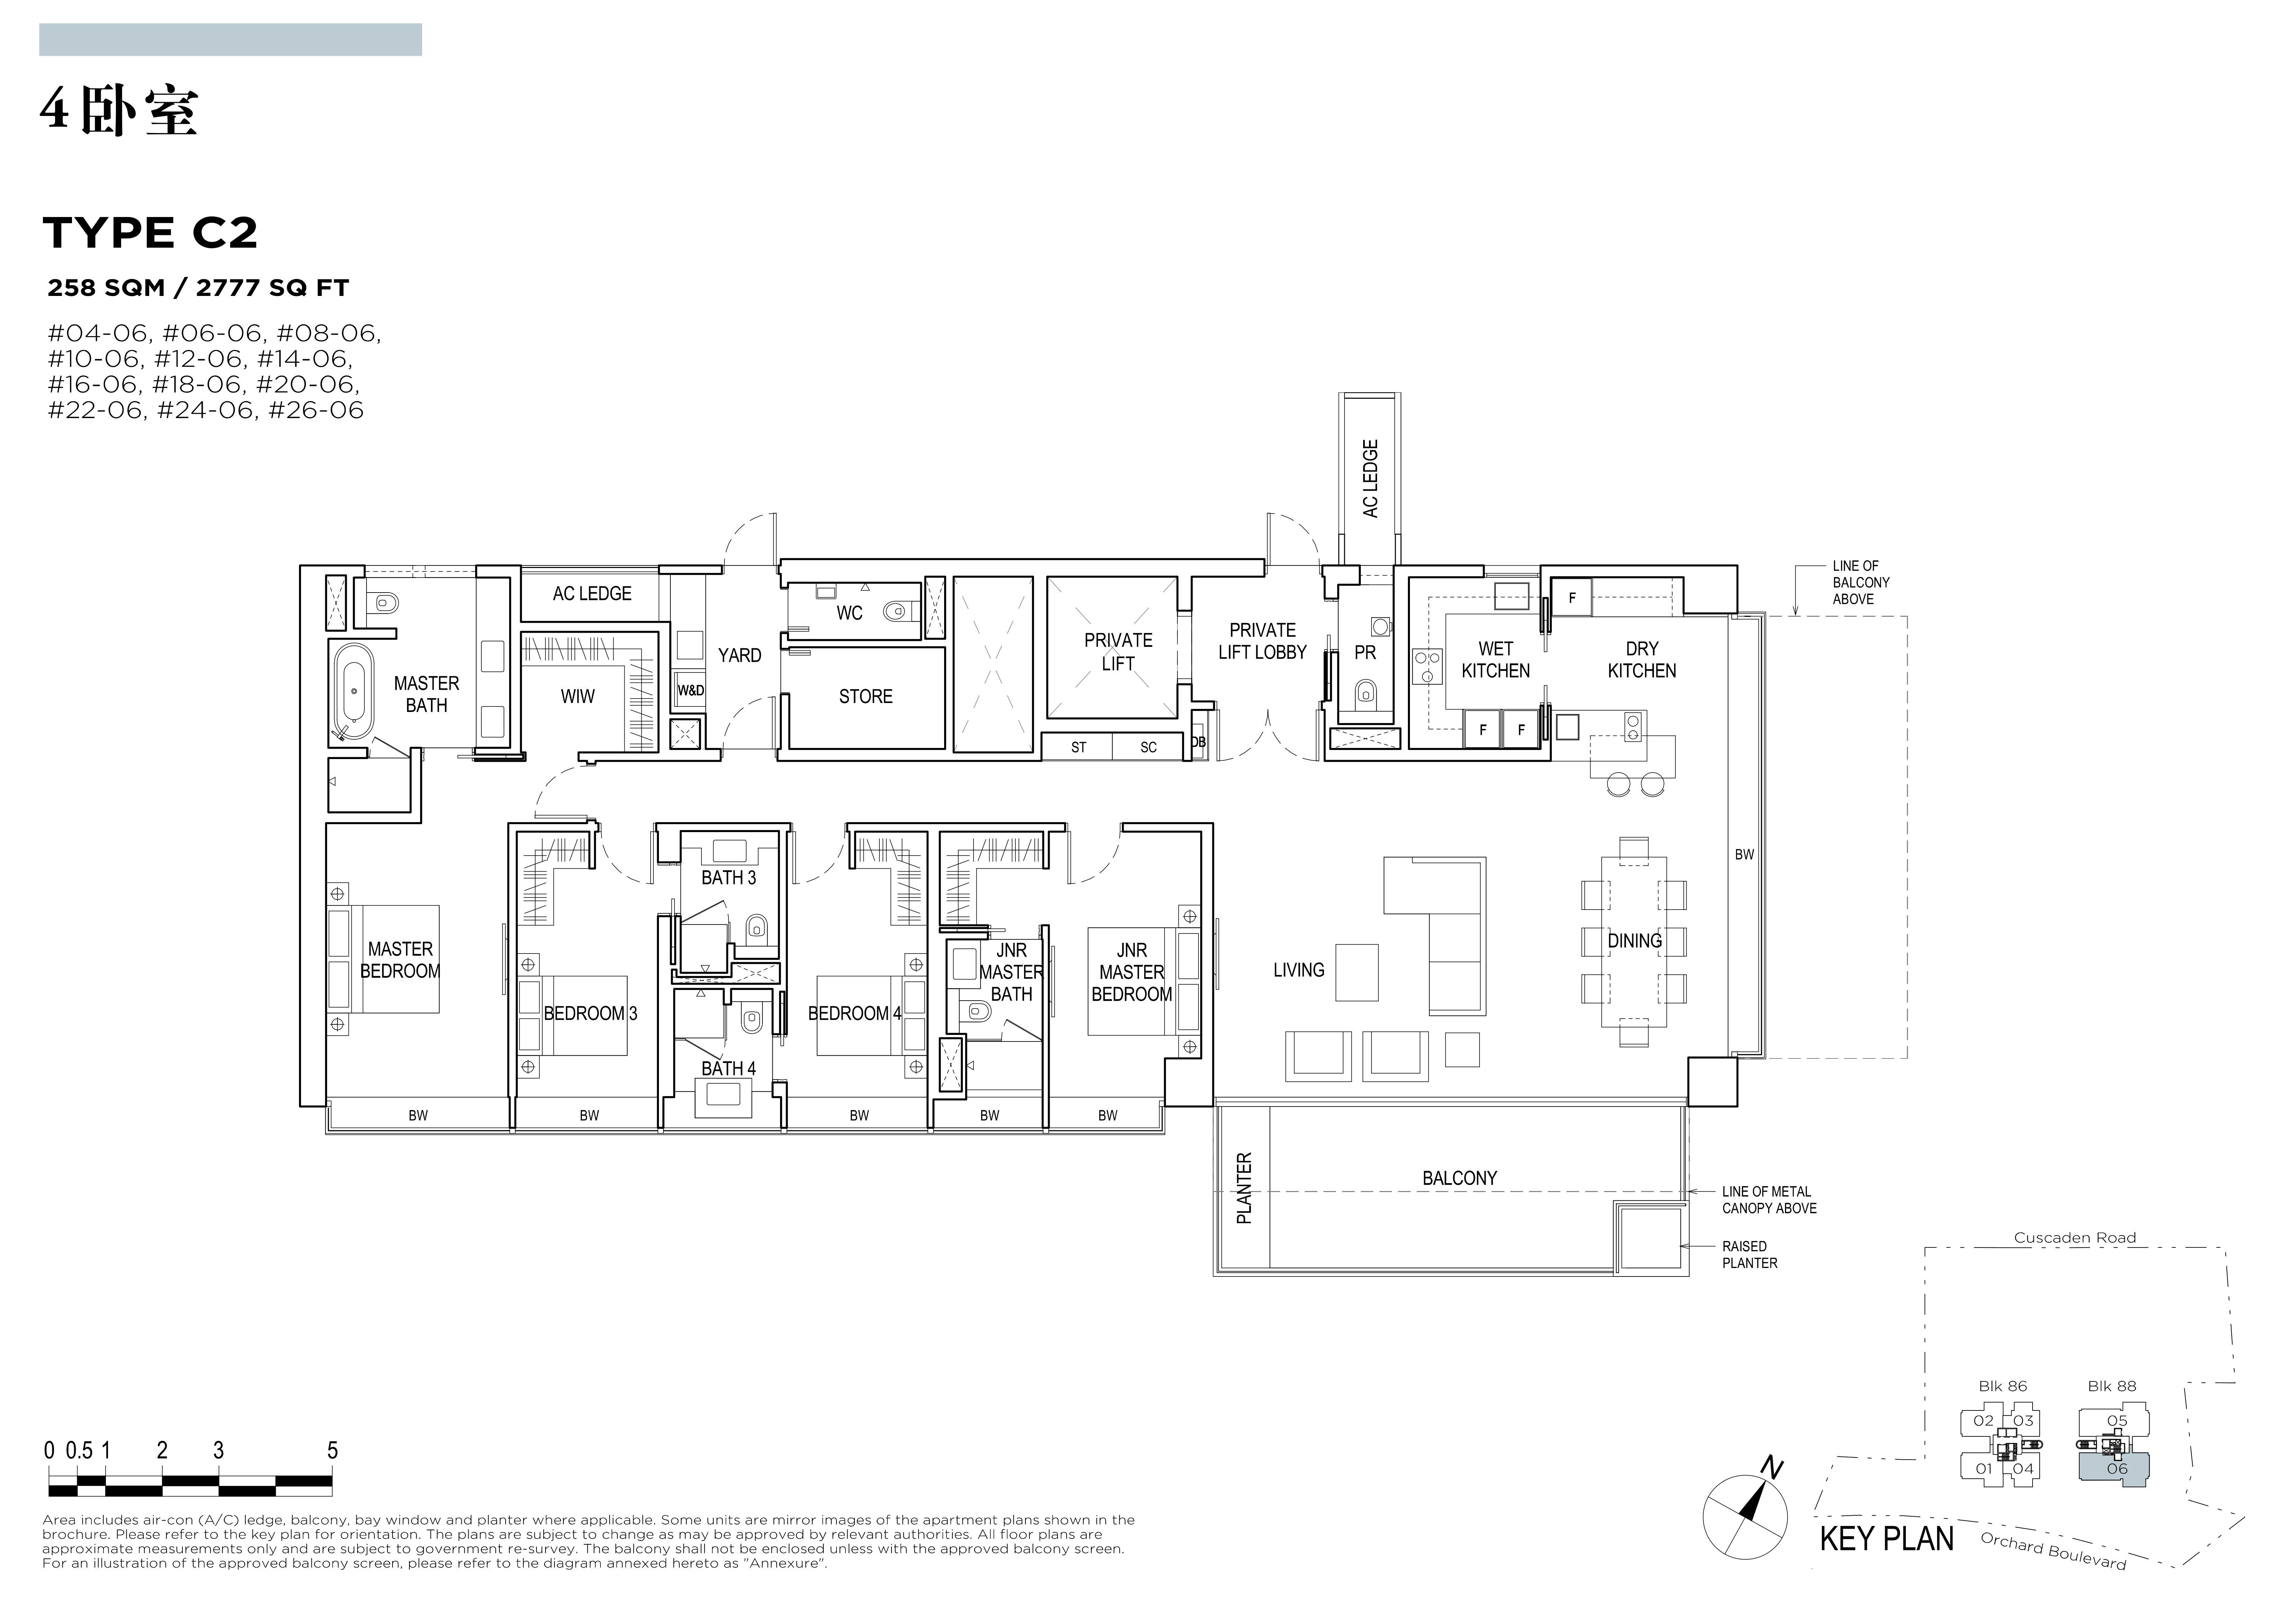 铂瑞雅居 Boulevard 88 floor plan 4 卧房 c2